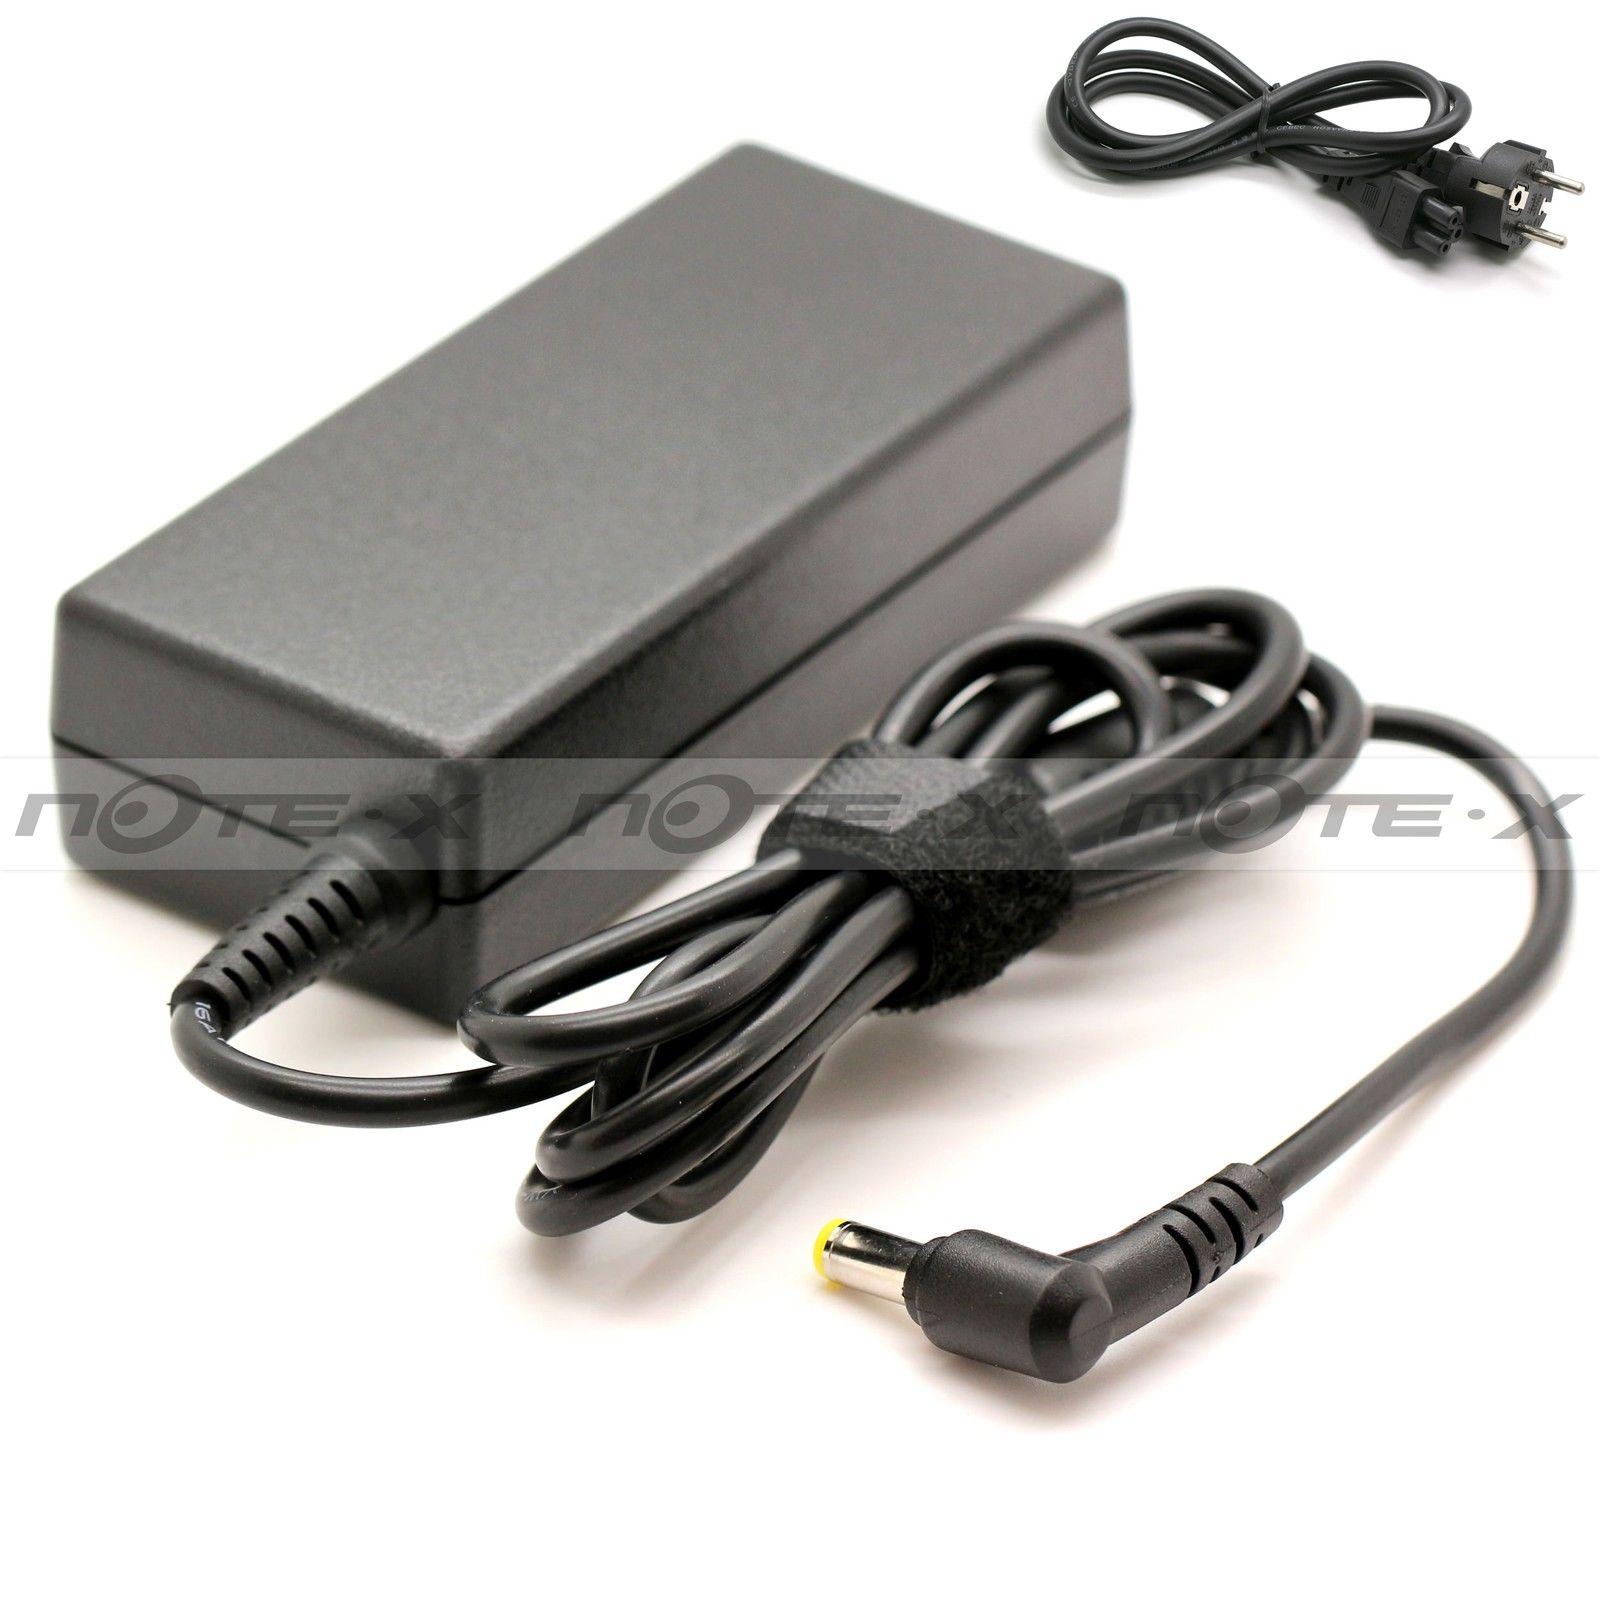 achat chargeur neuf acer aspire 9400 ordinateur portable. Black Bedroom Furniture Sets. Home Design Ideas